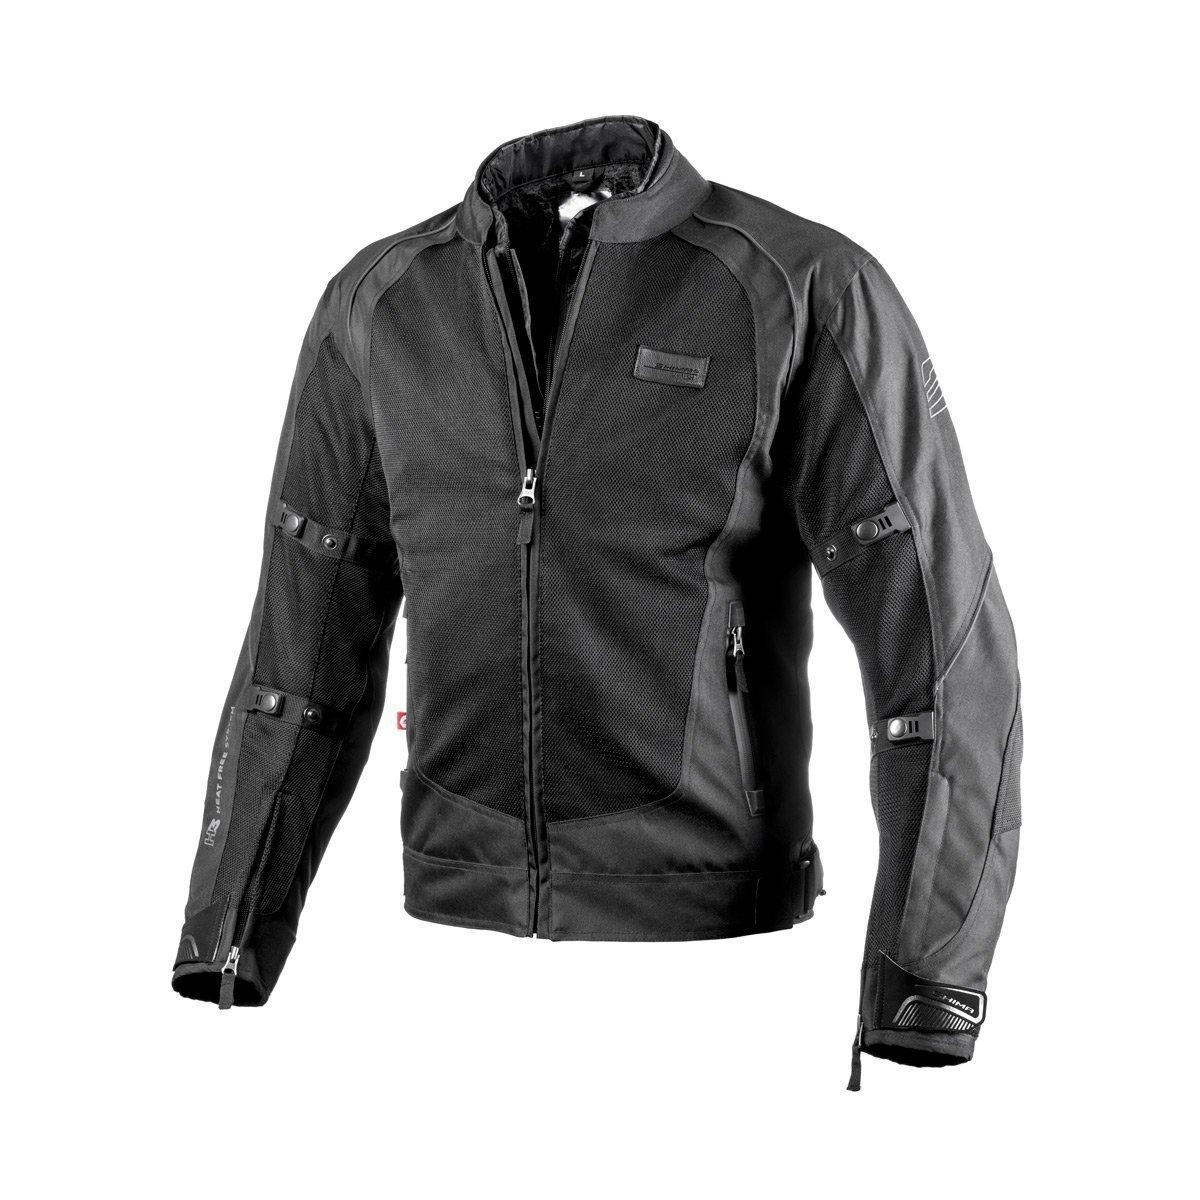 Shima X-MESH Tama/ño: M Sport Verano Reflexivo Elegante Comodidad Chaqueta de Moto Negro S-XXL